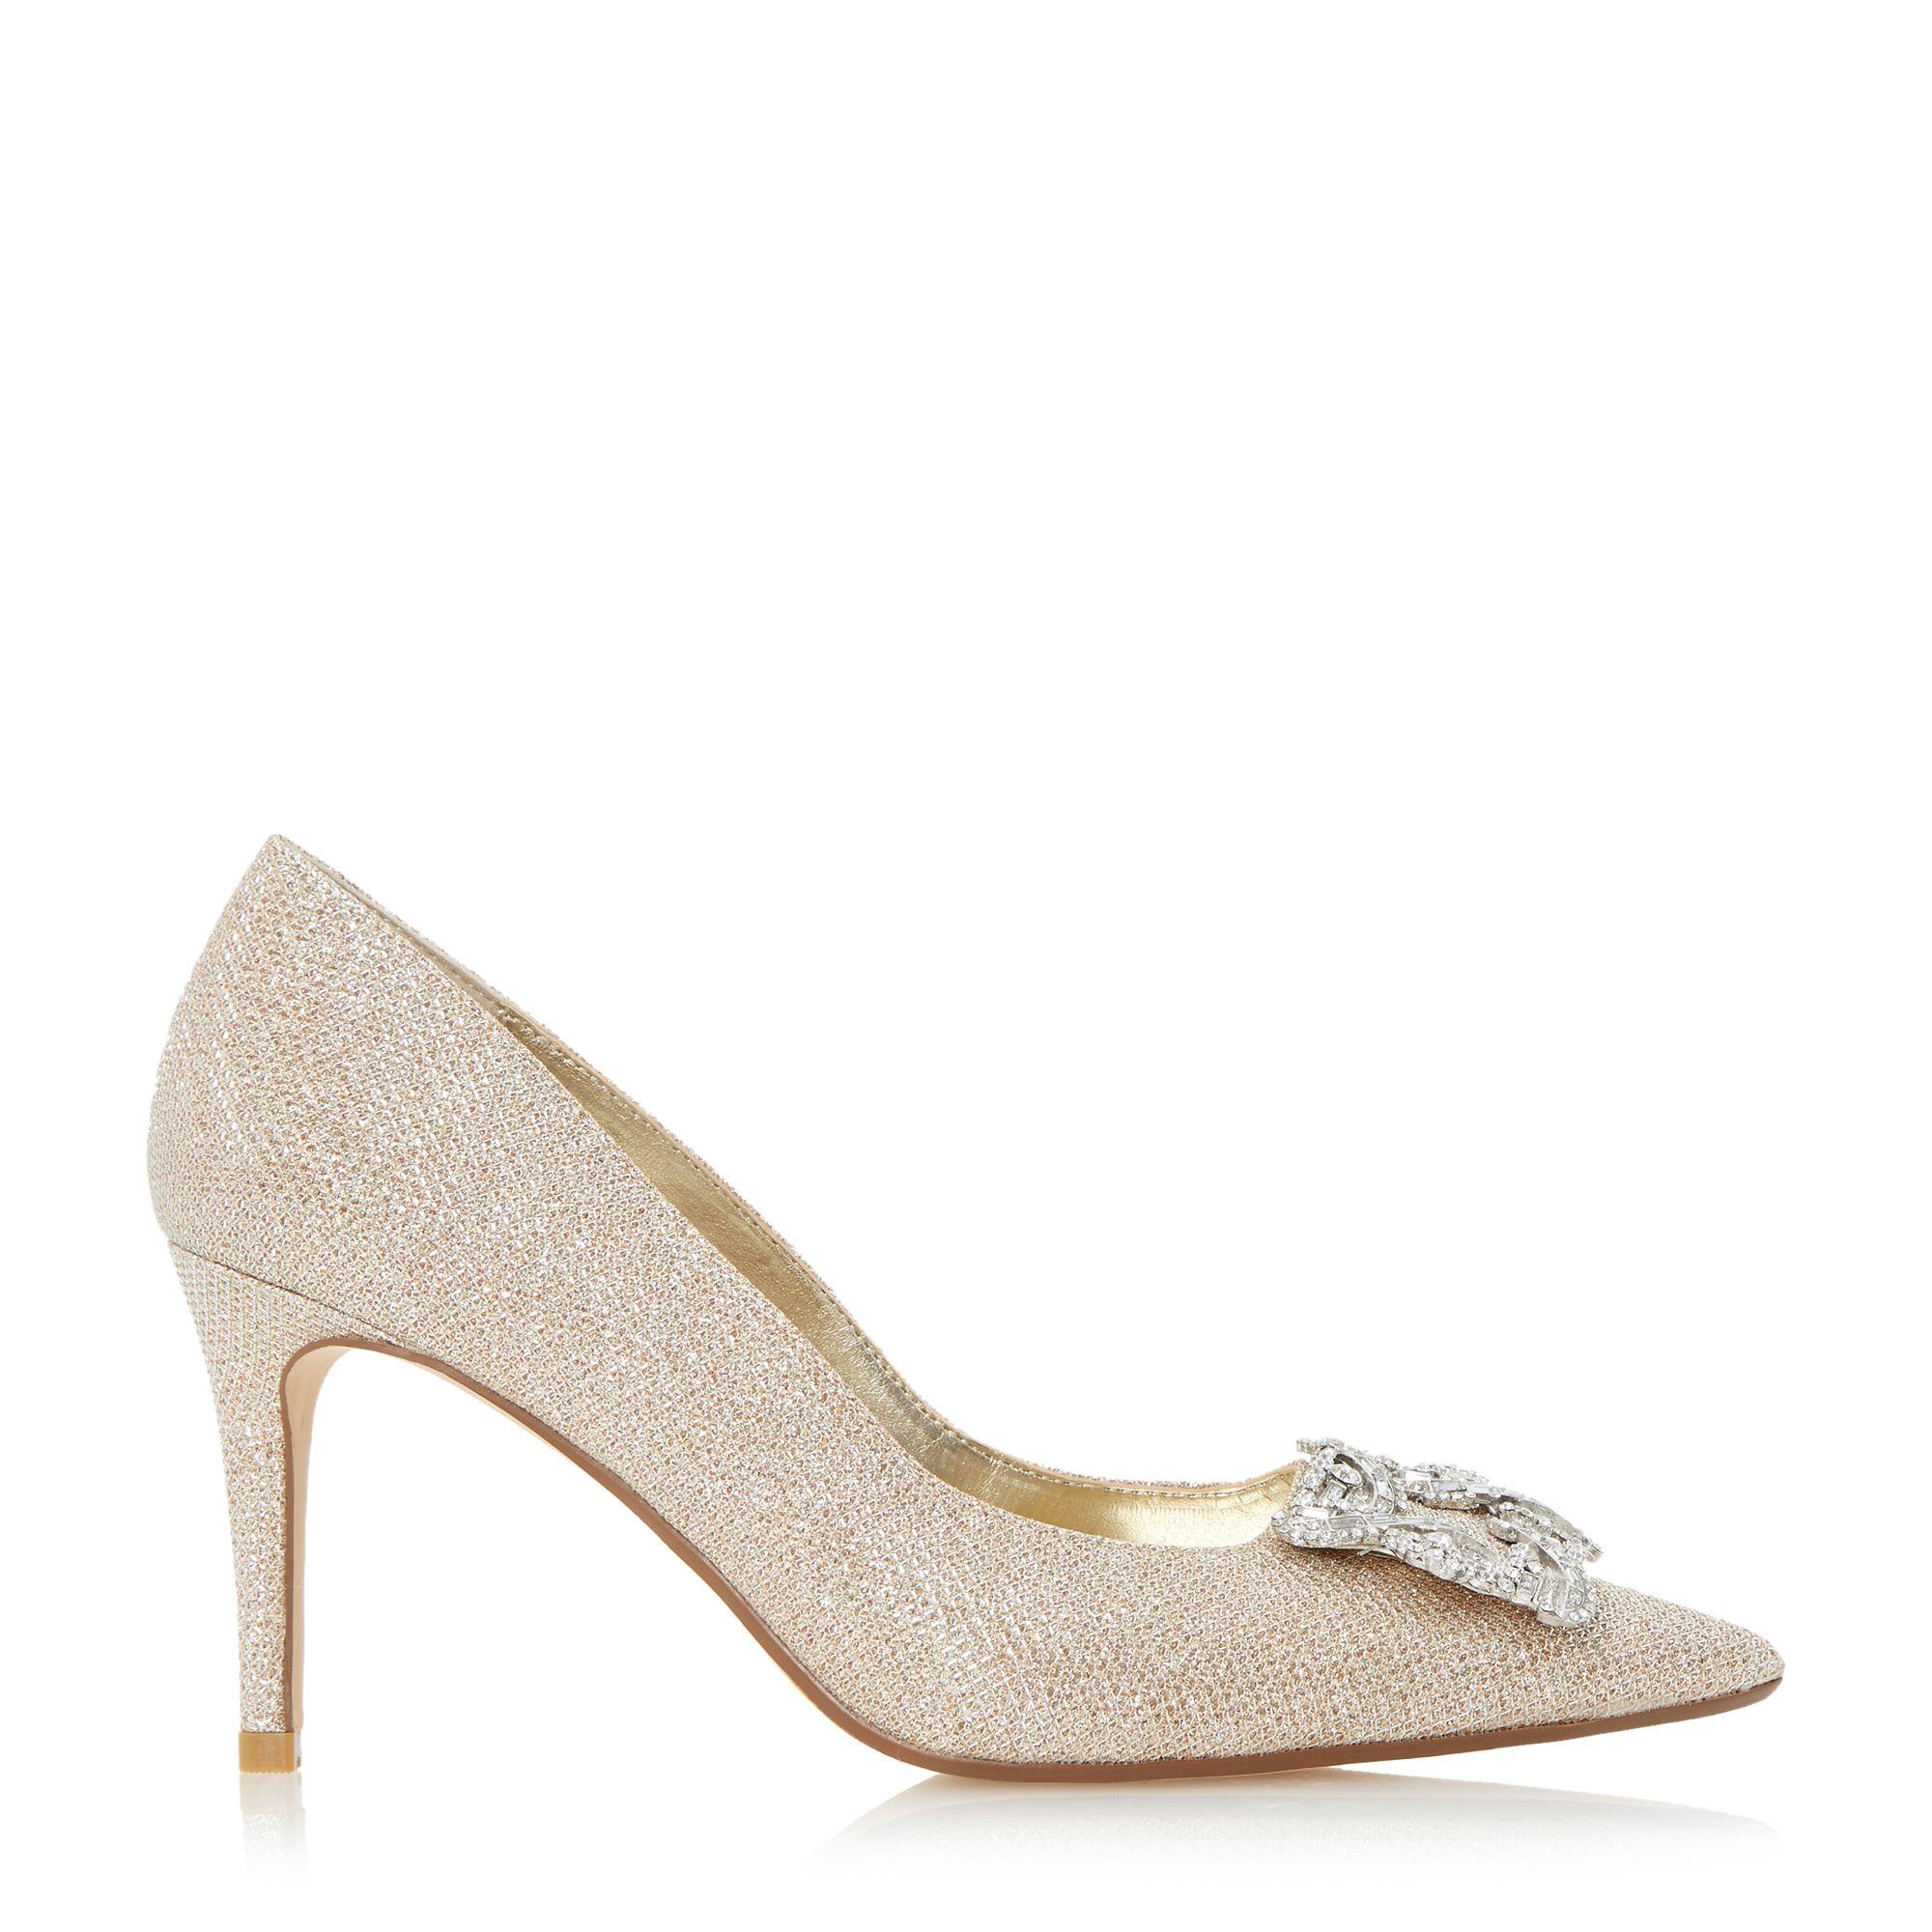 Dune Betti Jewelled Mid Heel Court Shoes In Metallic